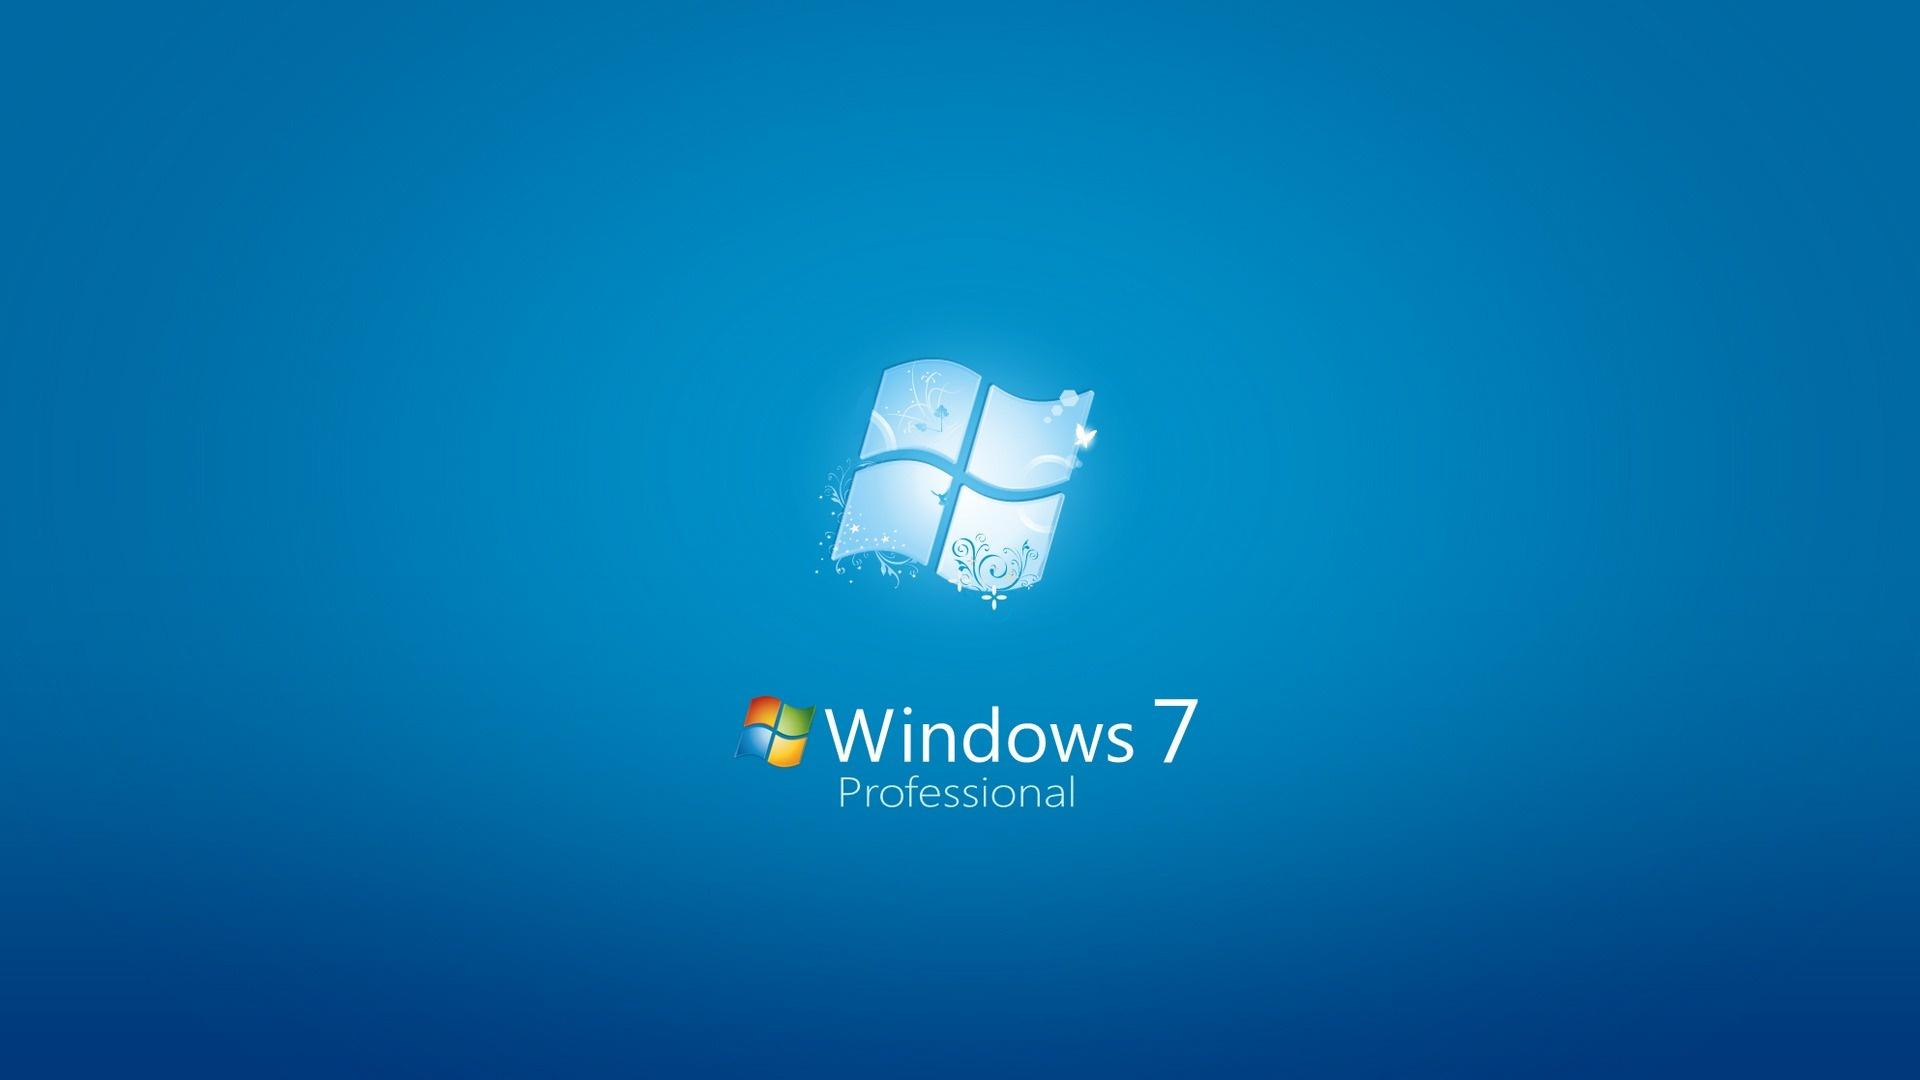 Windows 7 HD Wallpaper Theme Bin   Customization HD Wallpapers 1920x1080